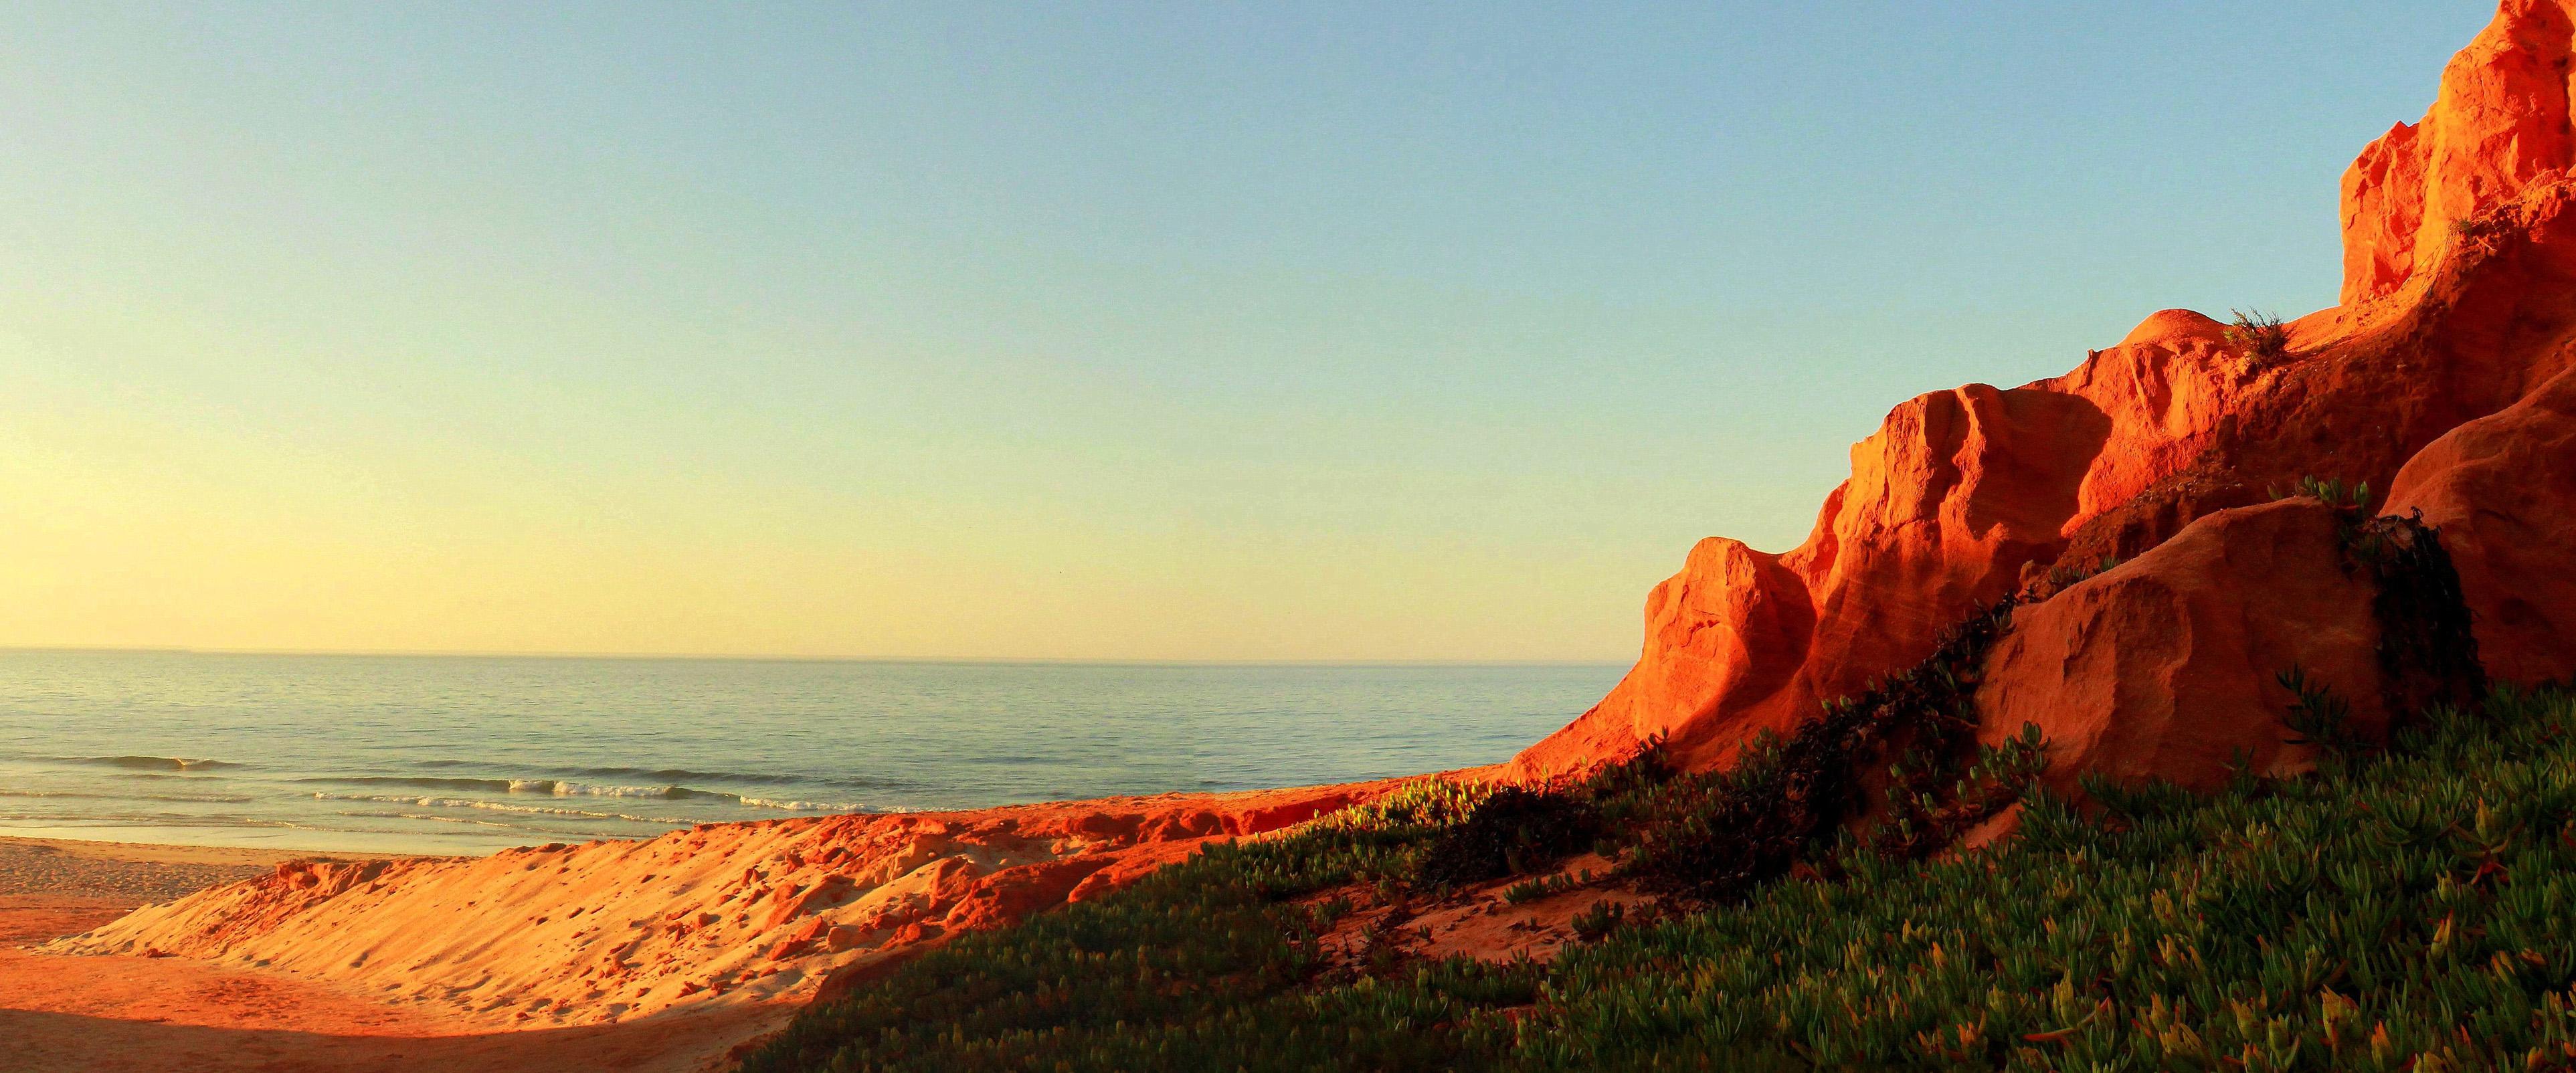 Bright sandstone coastal cliffs photo